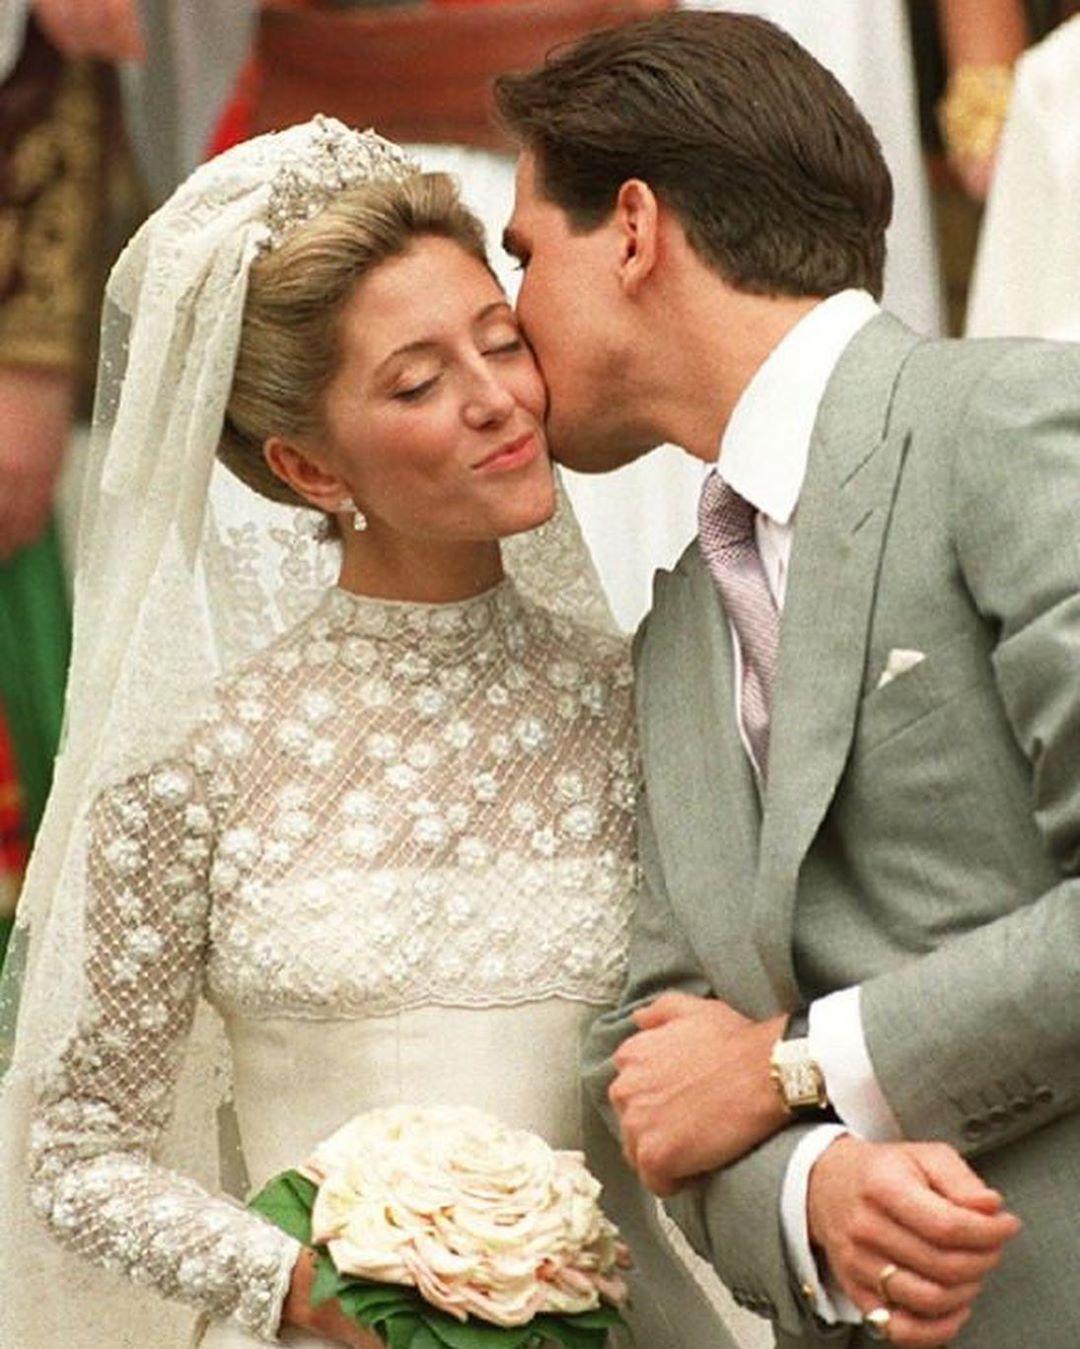 Marie Chantal – Παύλος: Κλείνουν 25 χρόνια γάμου! Τα δημόσια λόγια αγάπης που είπαν, ο ένας στον άλλο! Φωτογραφίες